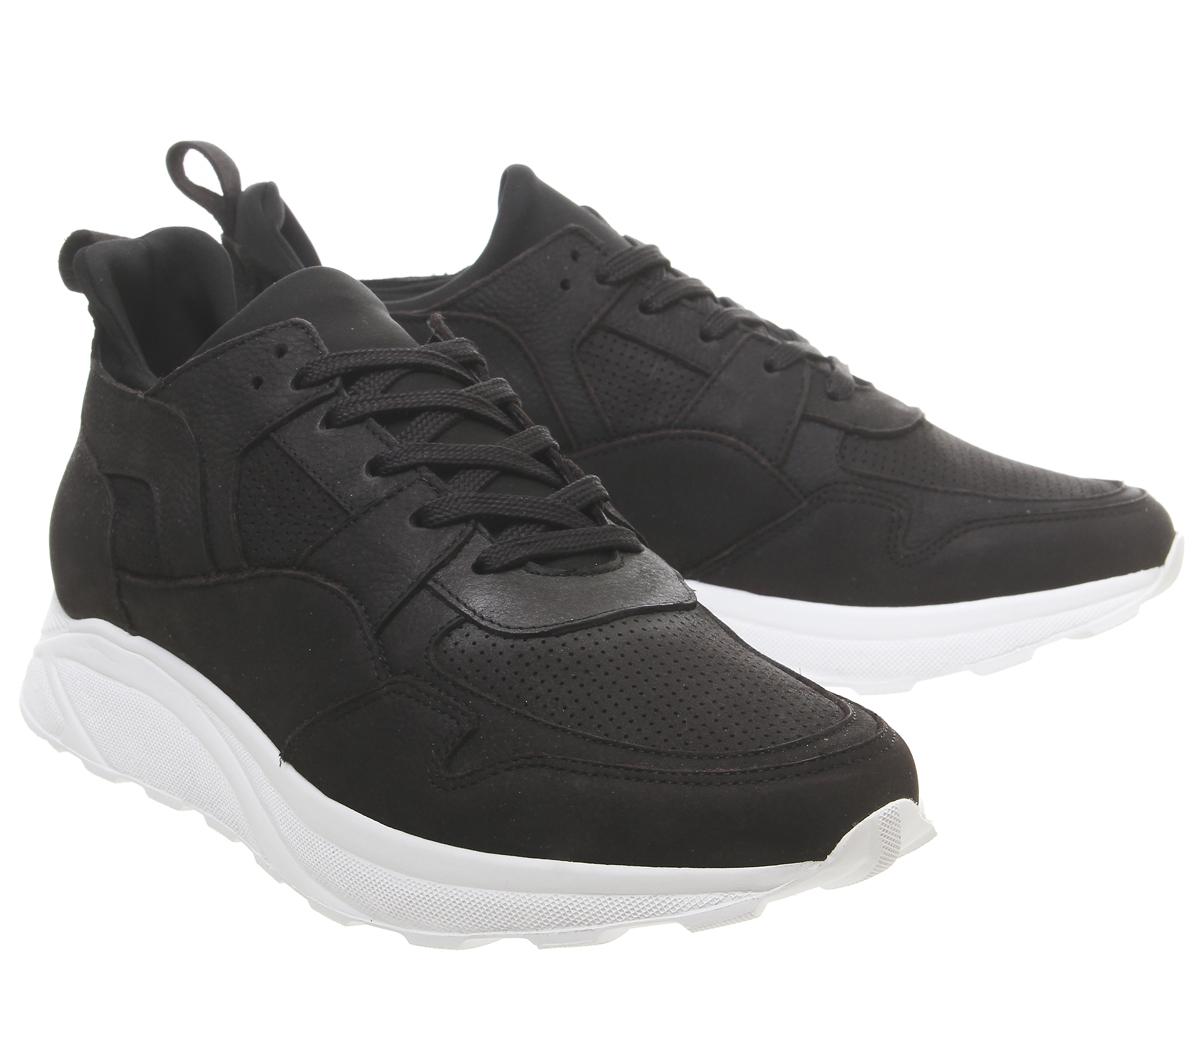 Mens-Office-Lacrosse-Trainers-Black-Nubuck-Casual-Shoes thumbnail 13